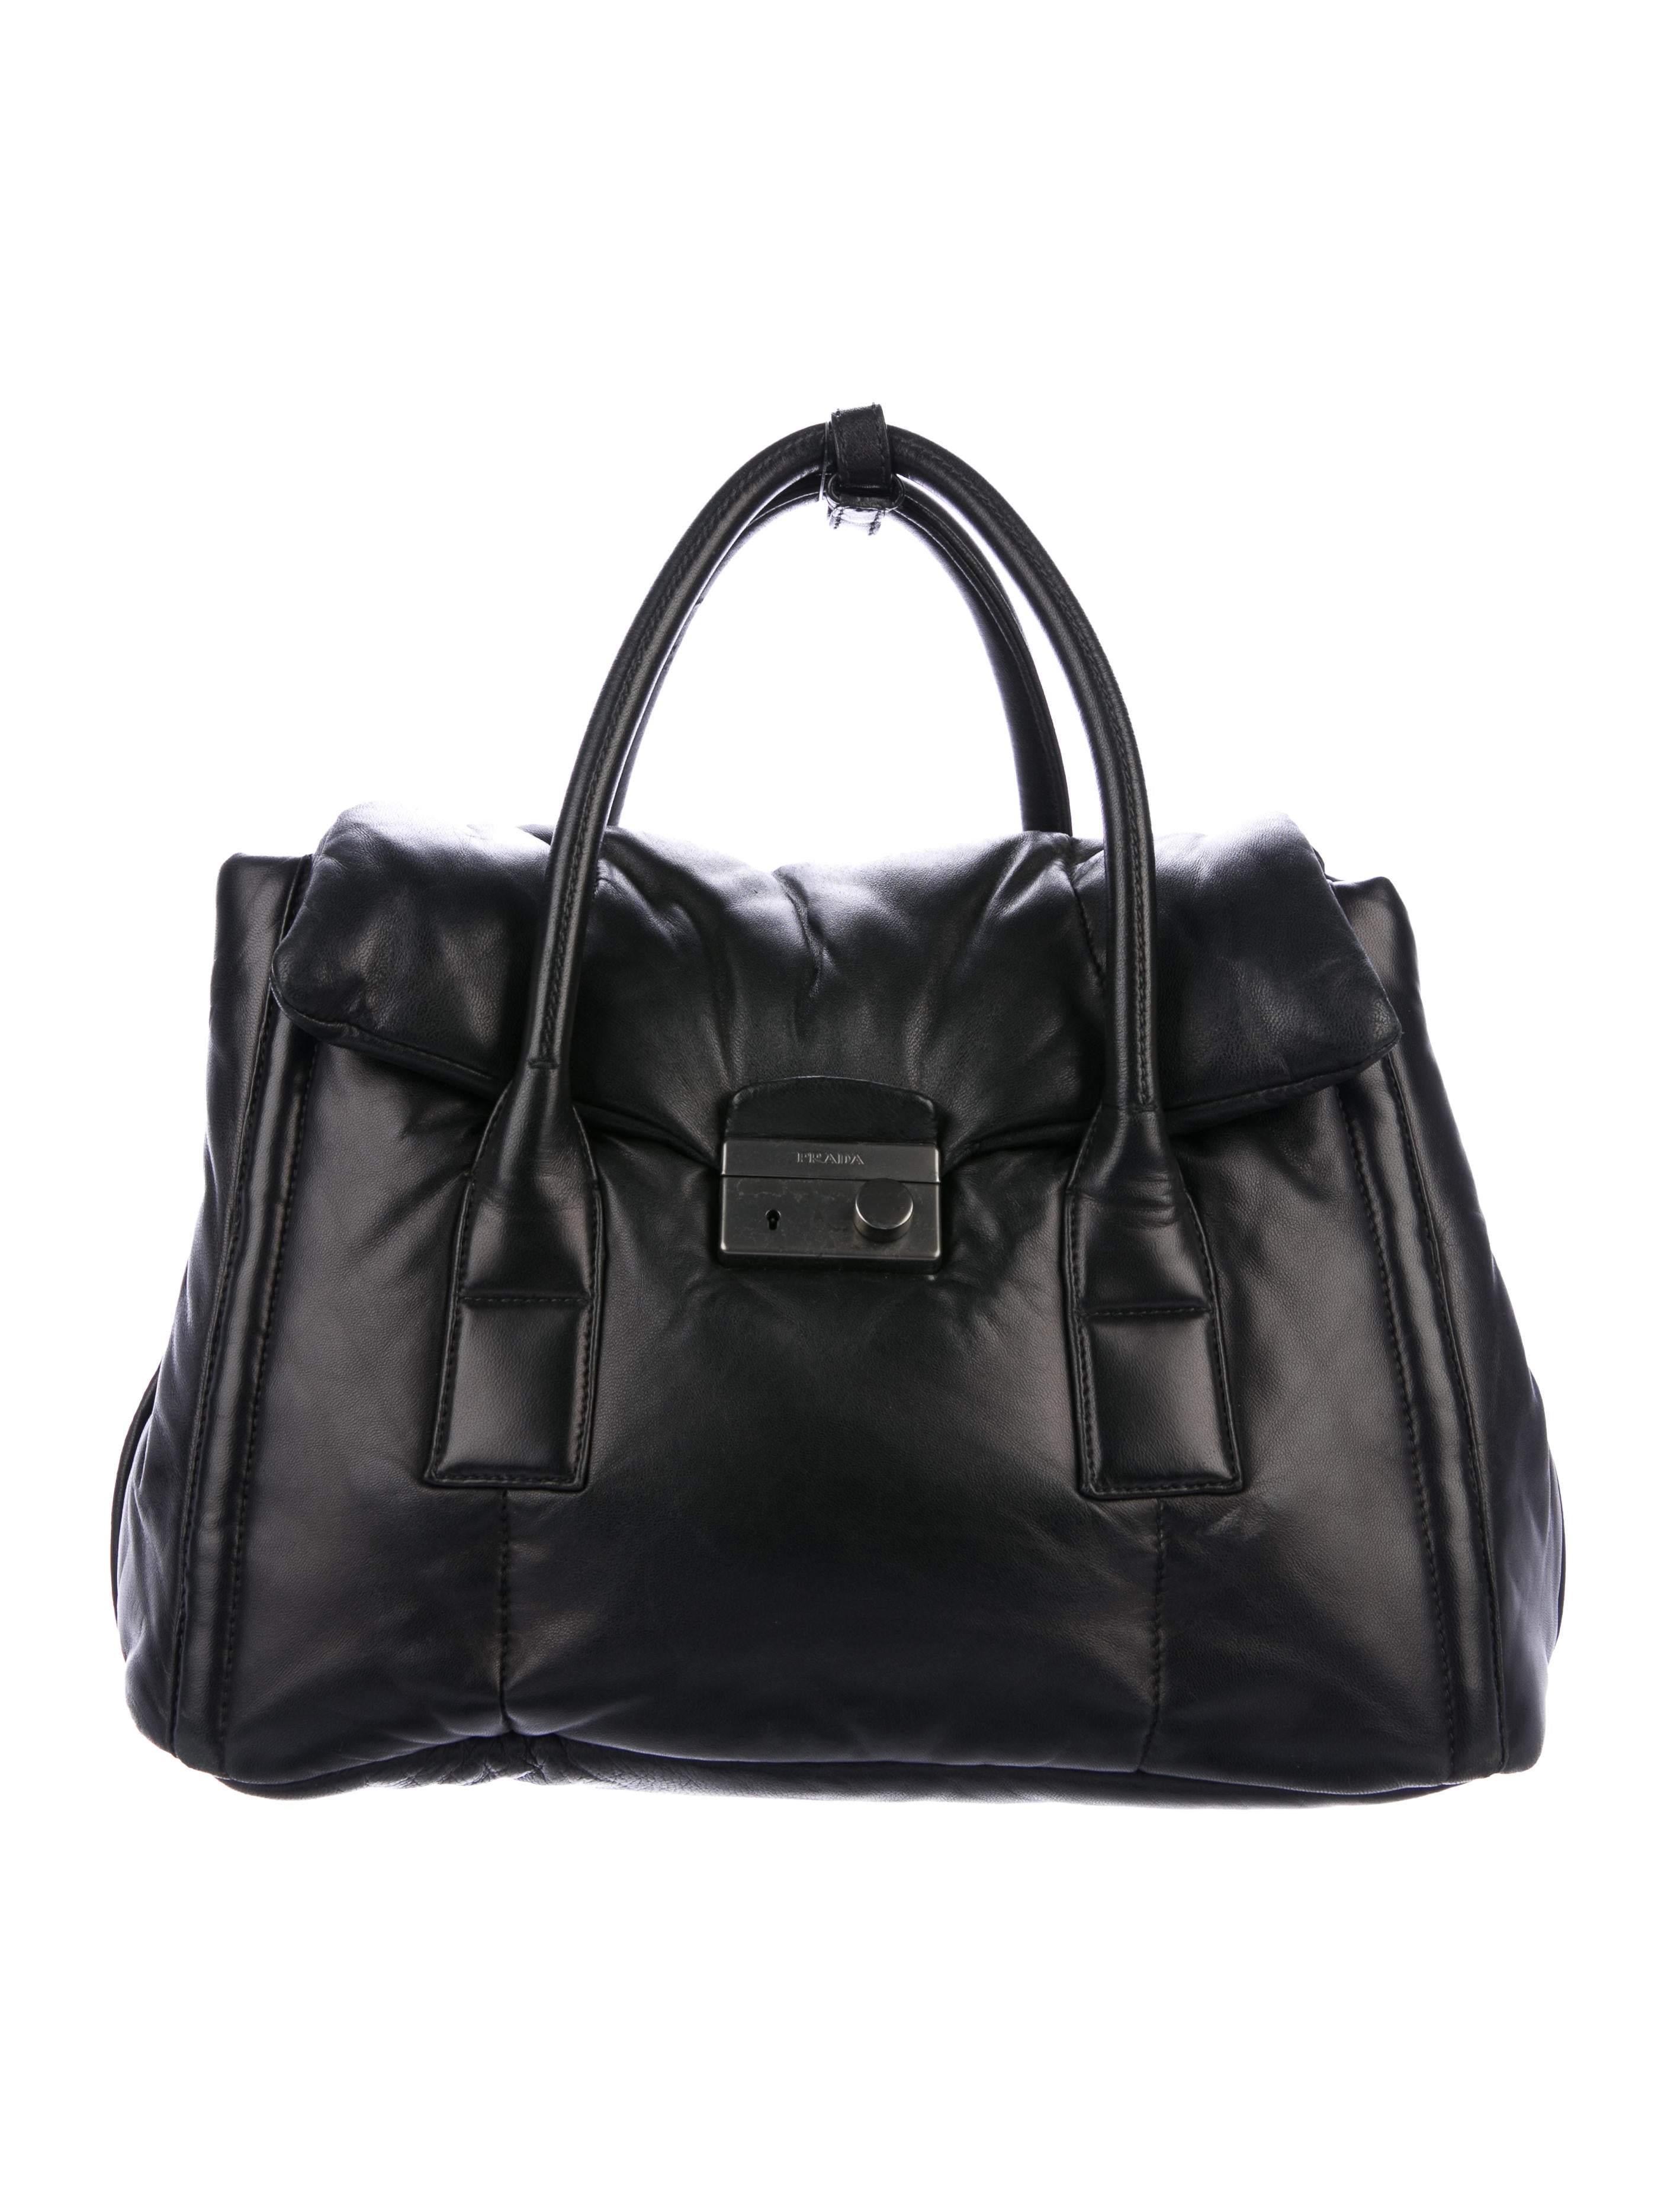 b96f4ba1b7ca Prada Nappa Gaufre Frame Bag - Handbags - PRA146949 | The RealReal